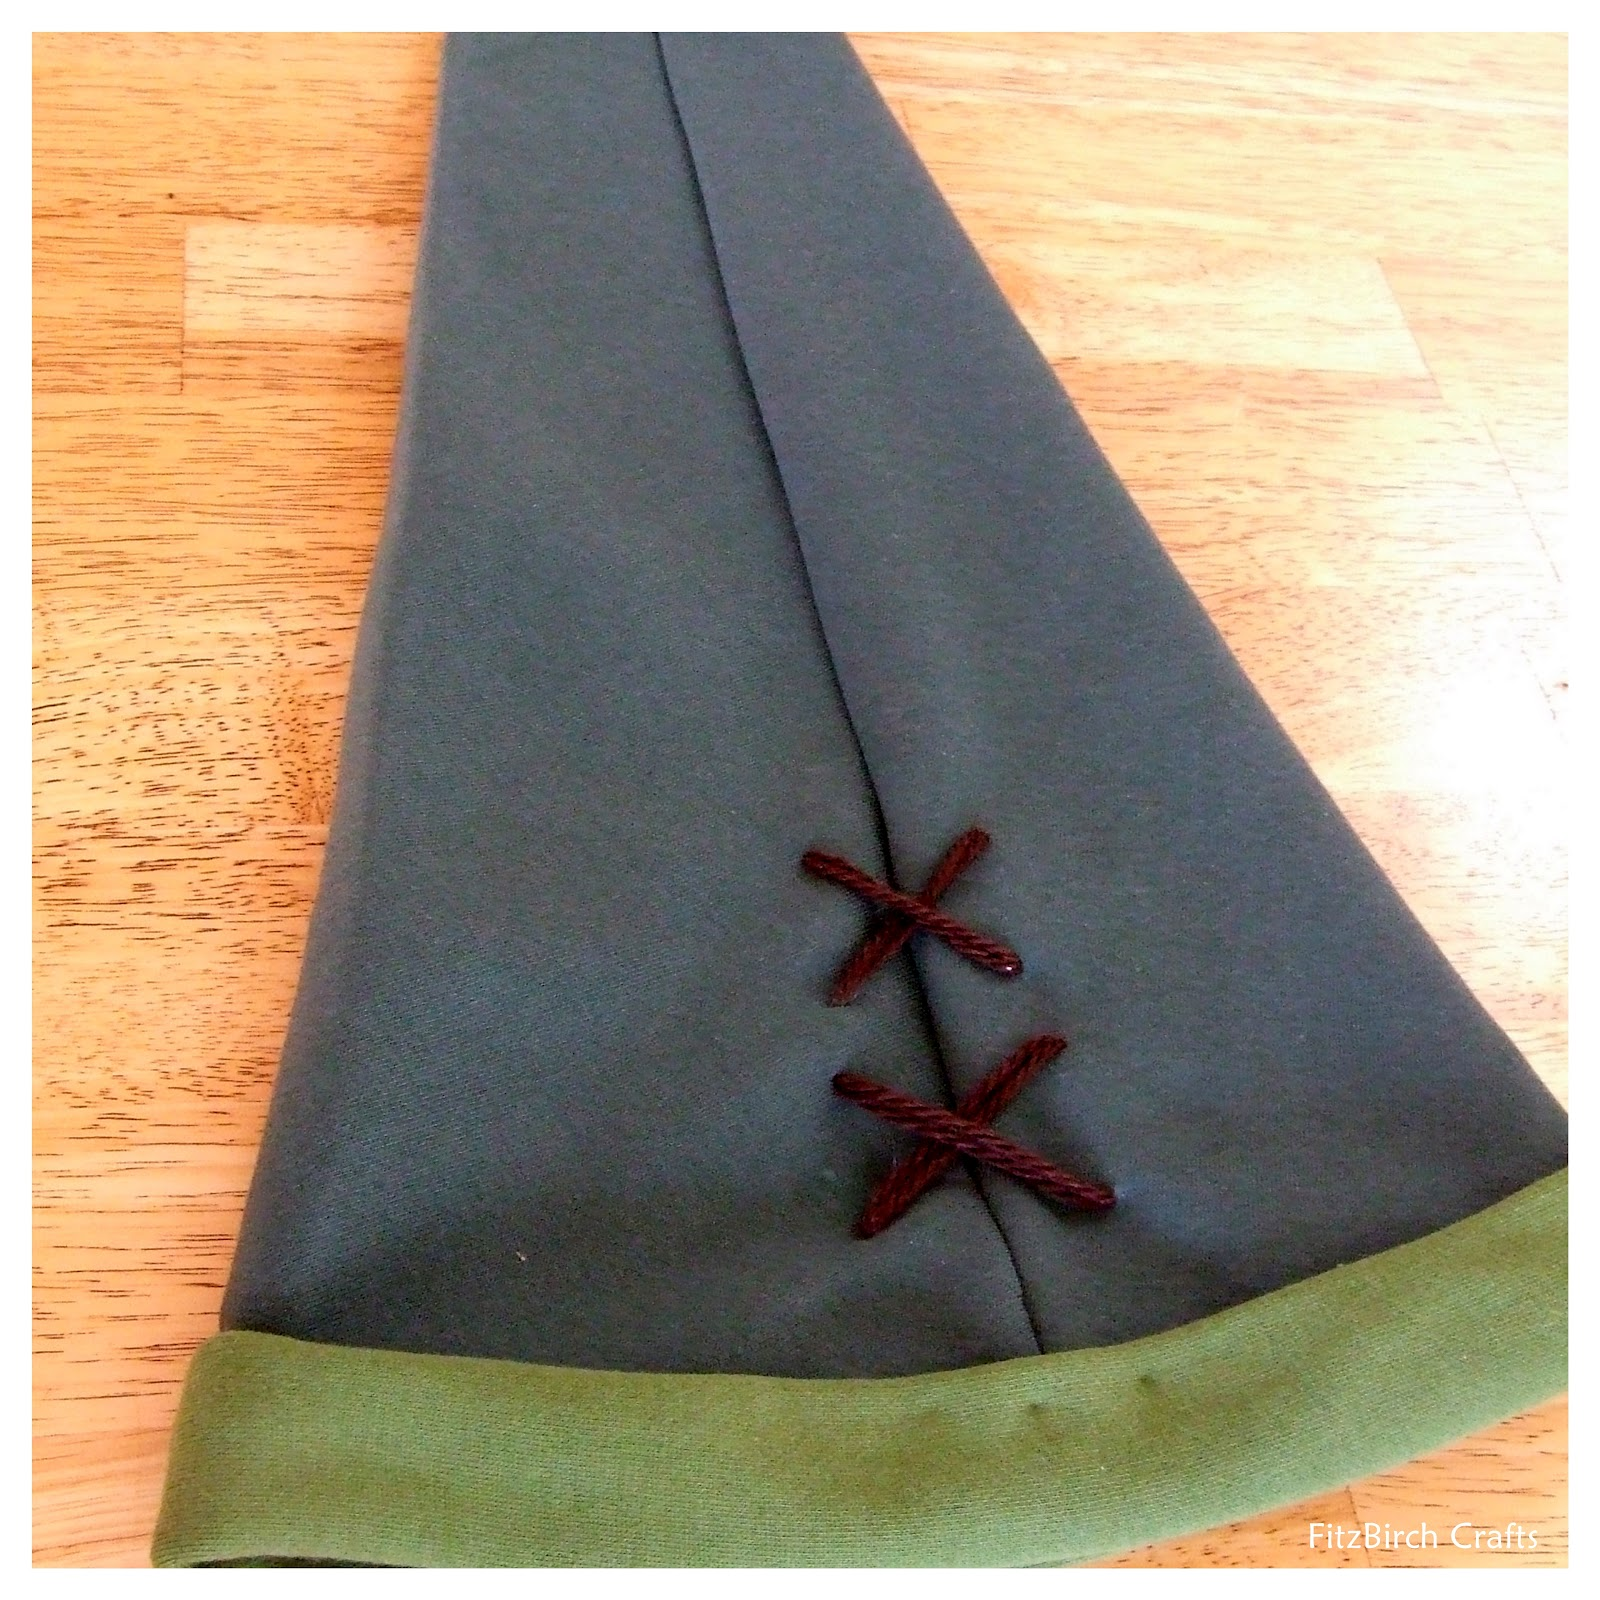 FitzBirch Crafts: The Legend of Zelda - Link Hat